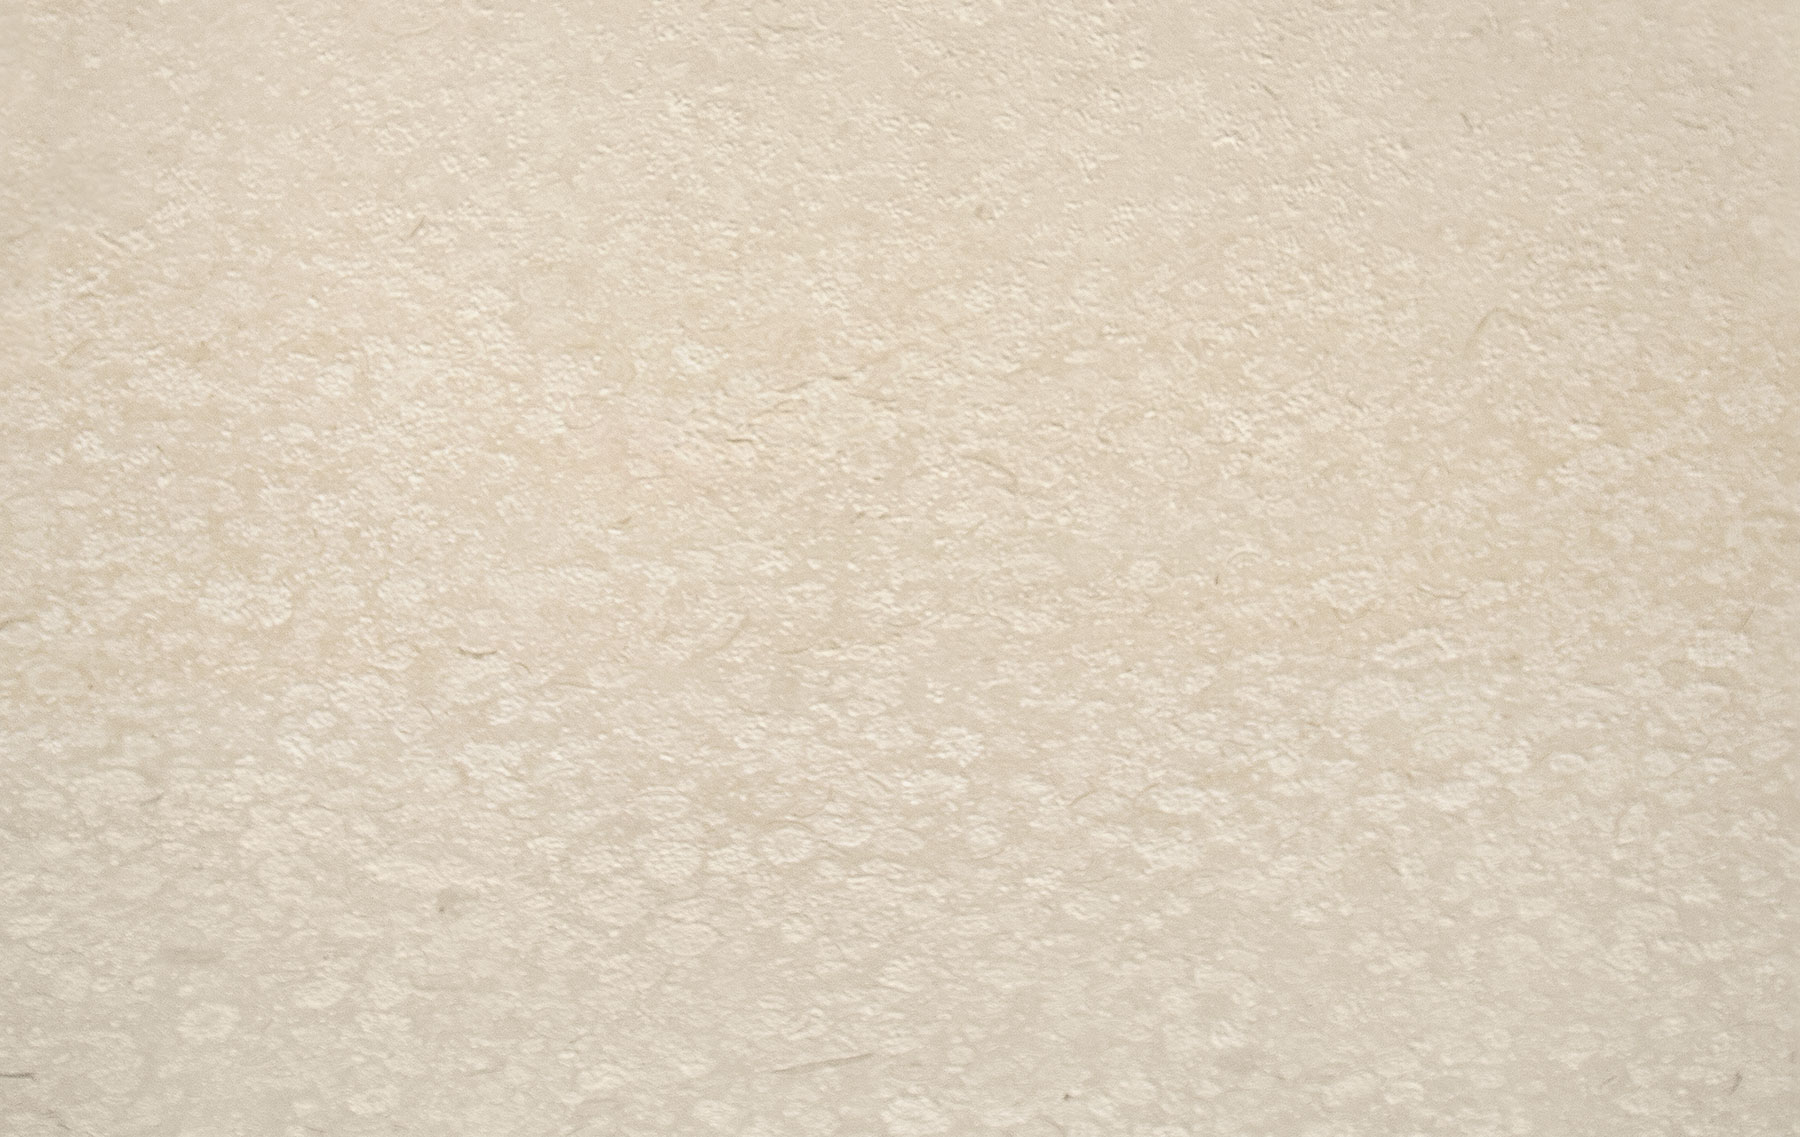 Caliza alba envejecida